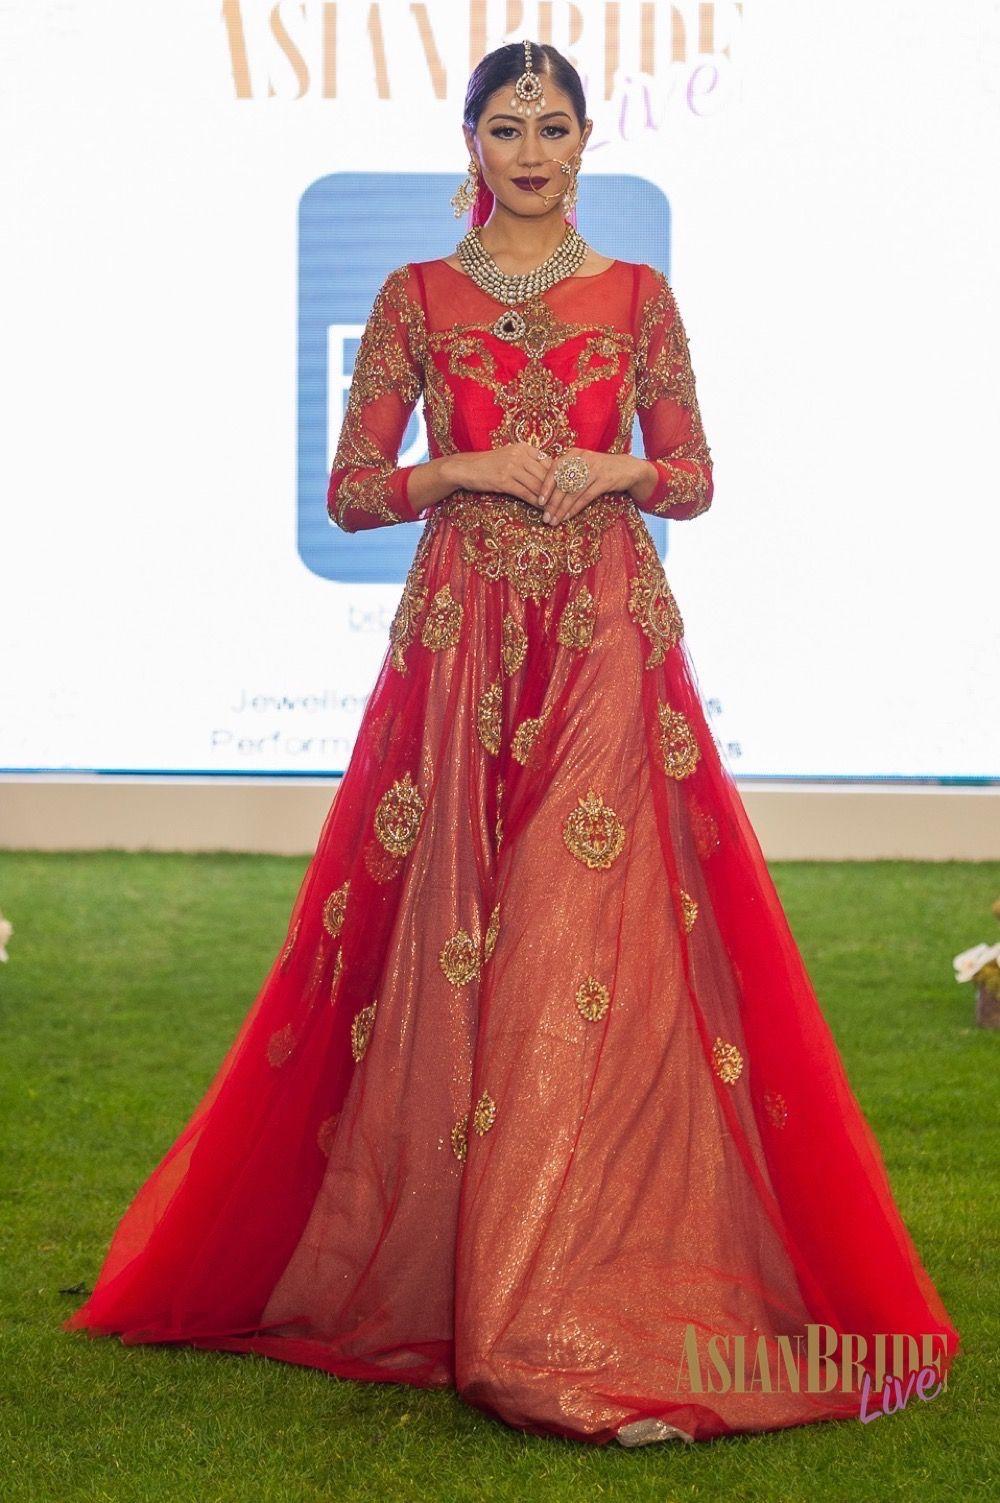 ecdf37c7be Red Bridal Lengha Bibi London -INDIAN-PAKISTANI-WEDDING-FASHION ...